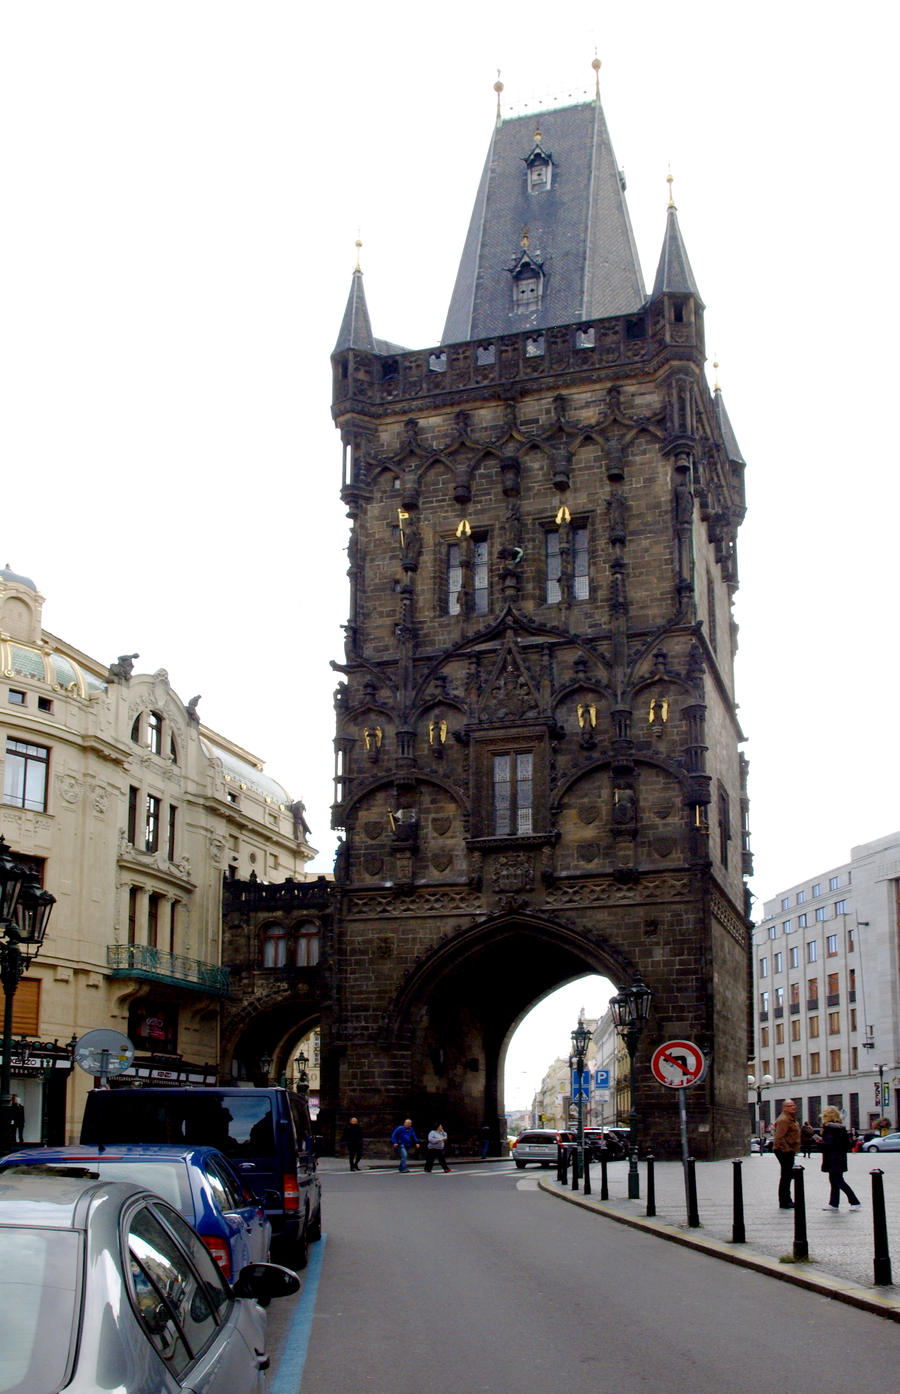 Architecture Appreciation in Prague08 by abelamario